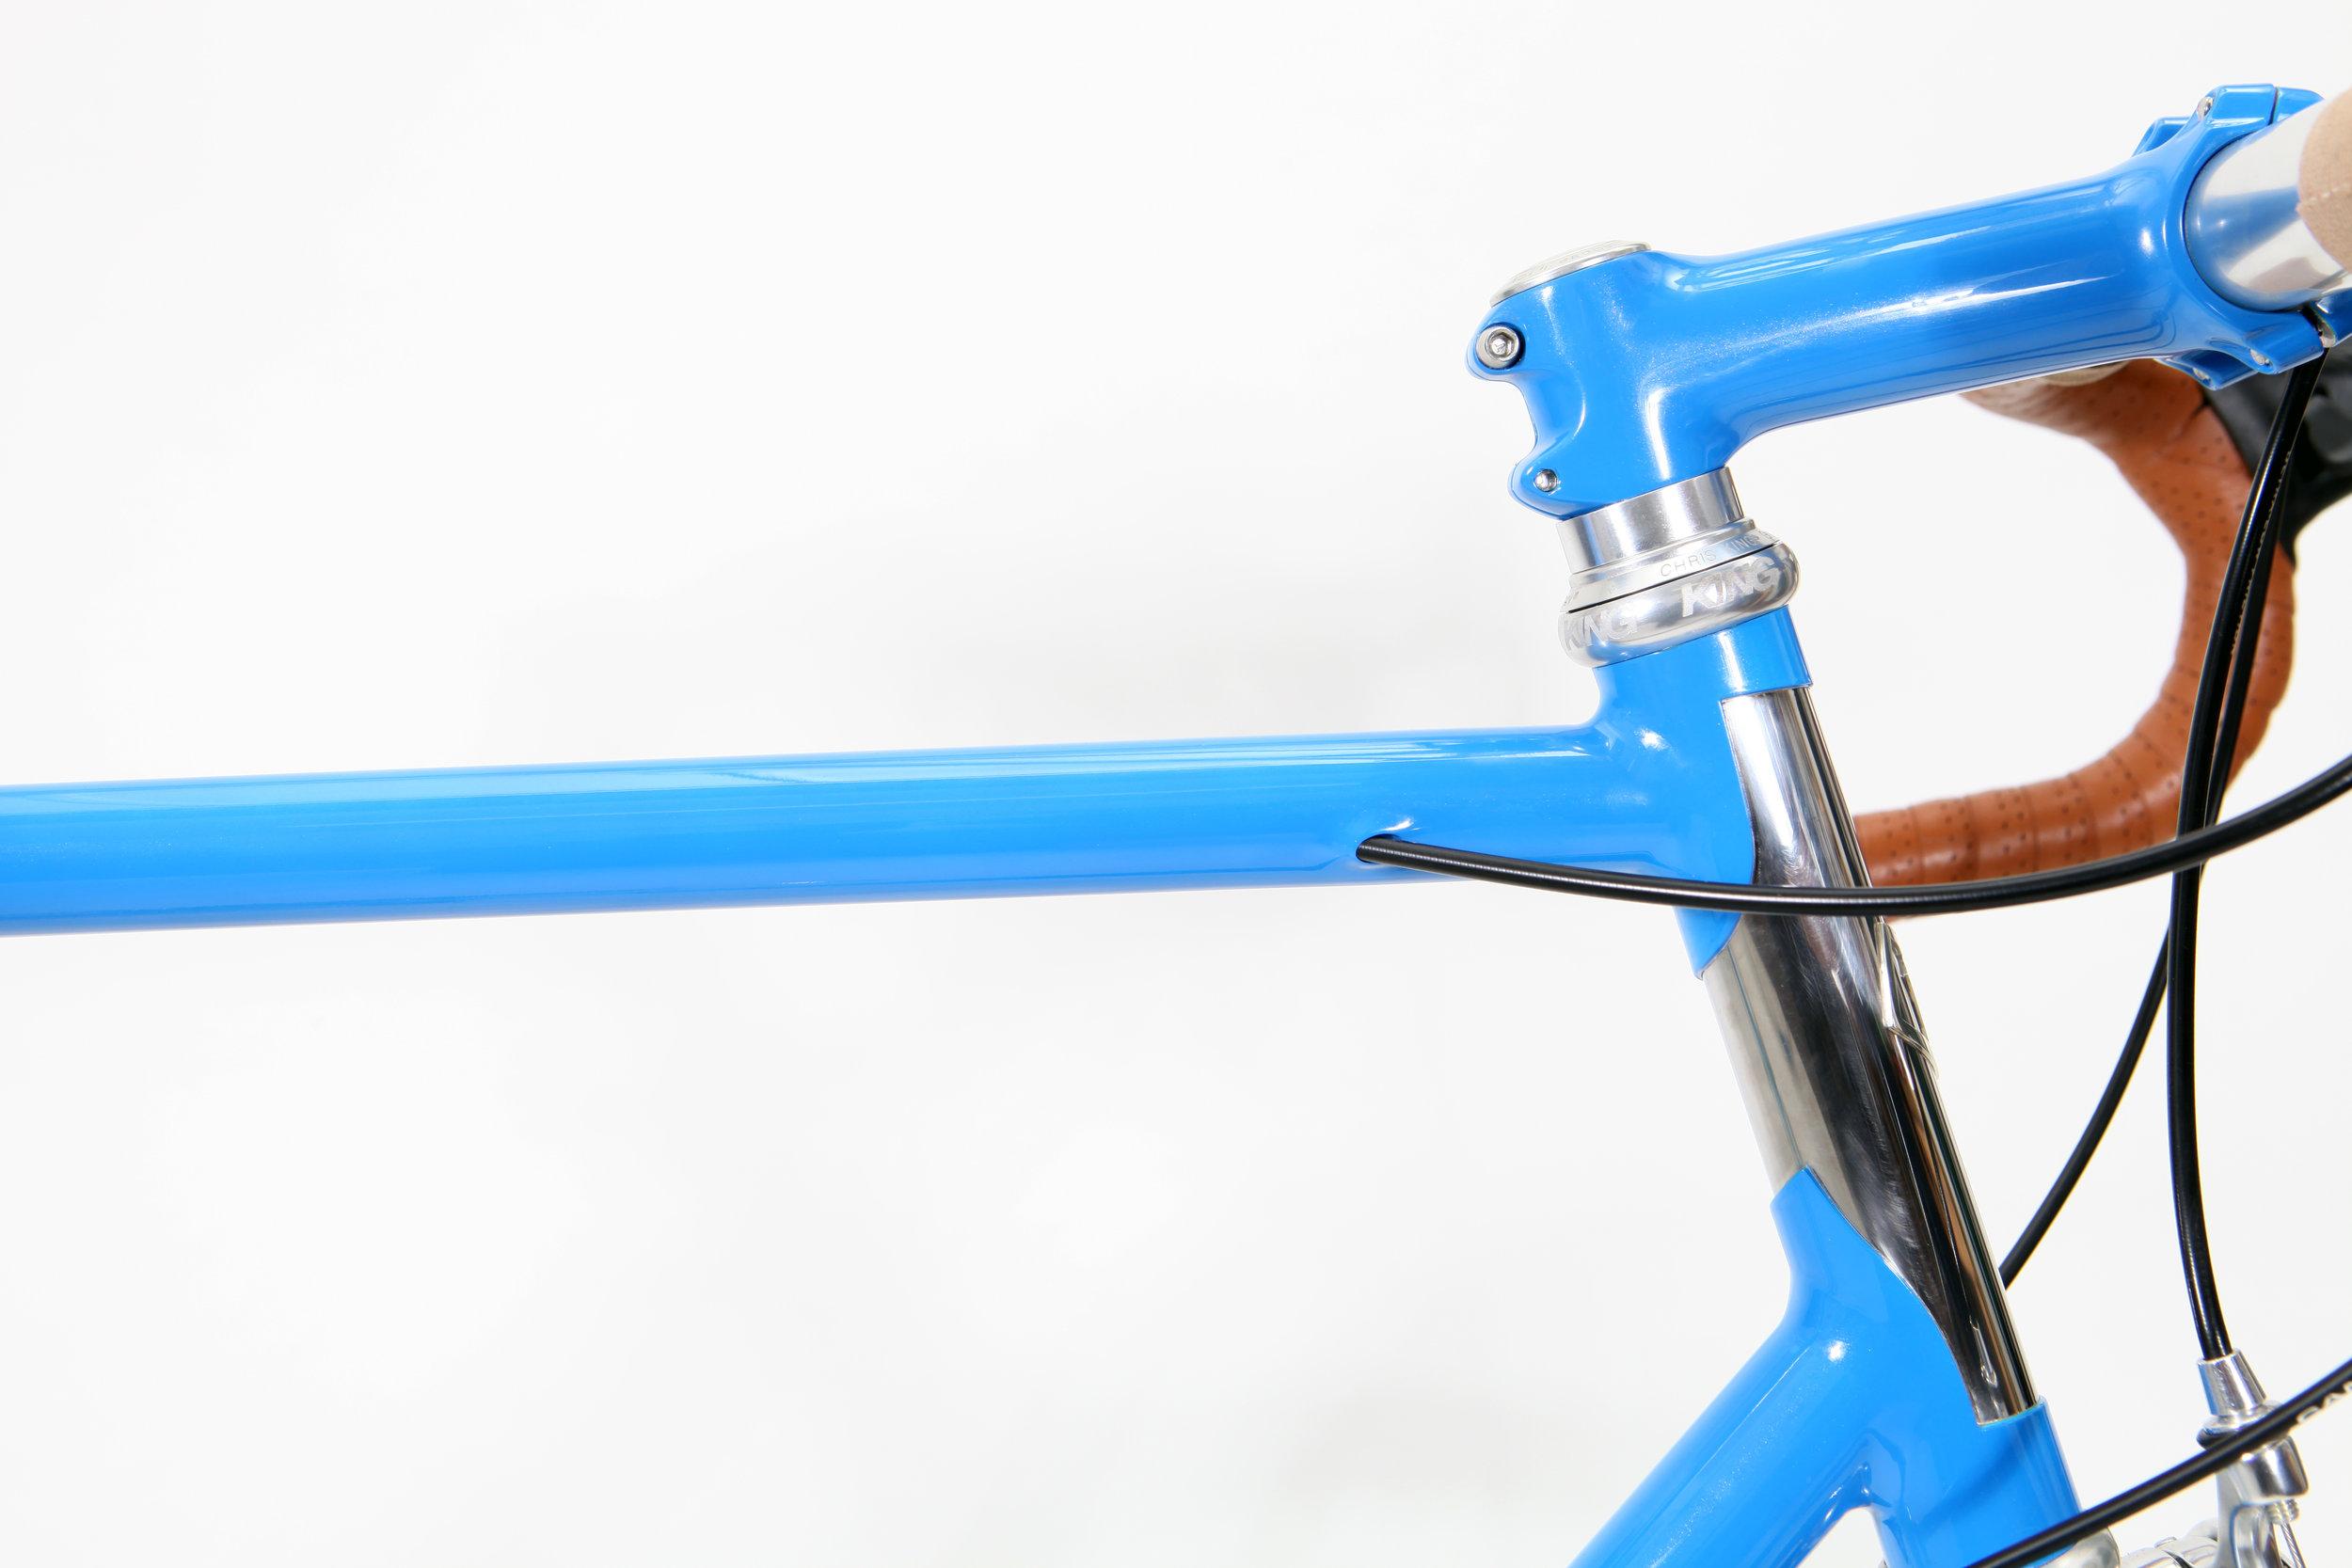 Modern Classic Lugged Stainless Steel Bespoke Bicycle, Reynolds 953, Bi-laminate Head tube